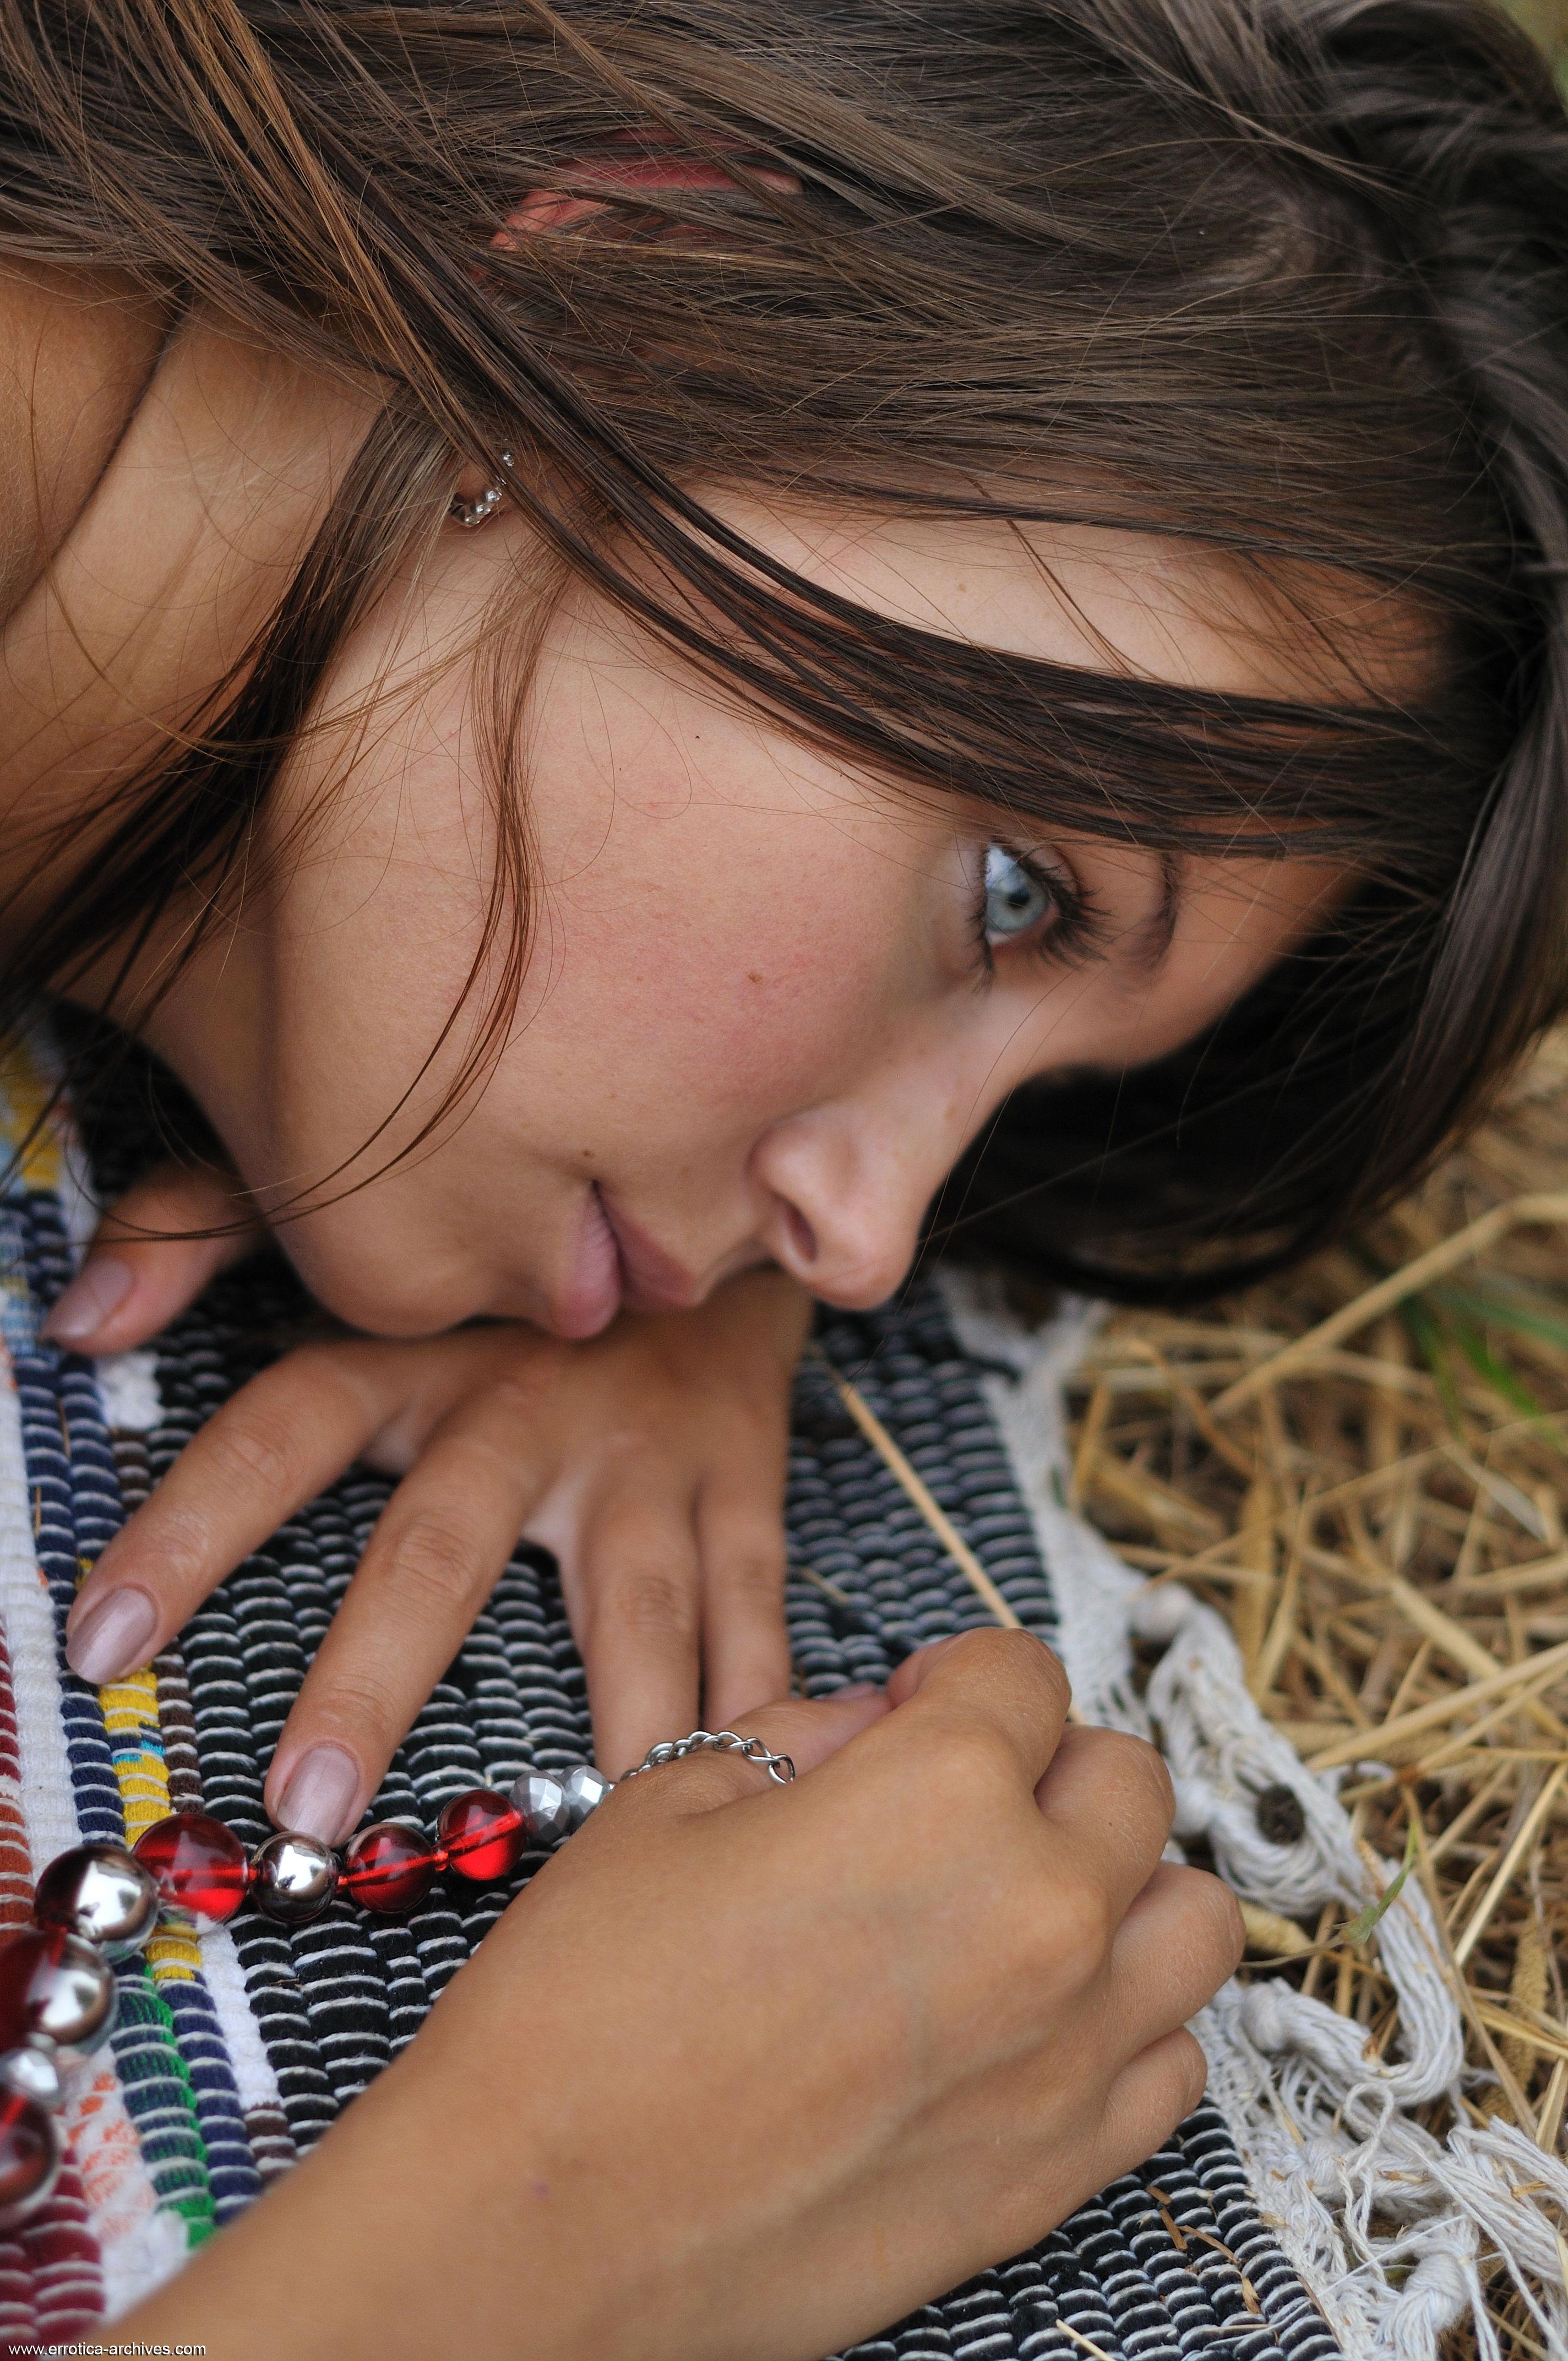 Errotica Archives Magazine Errotica Archives Women Brunette Blue Eyes Long Hair Towel Grass Necklace Katarina B